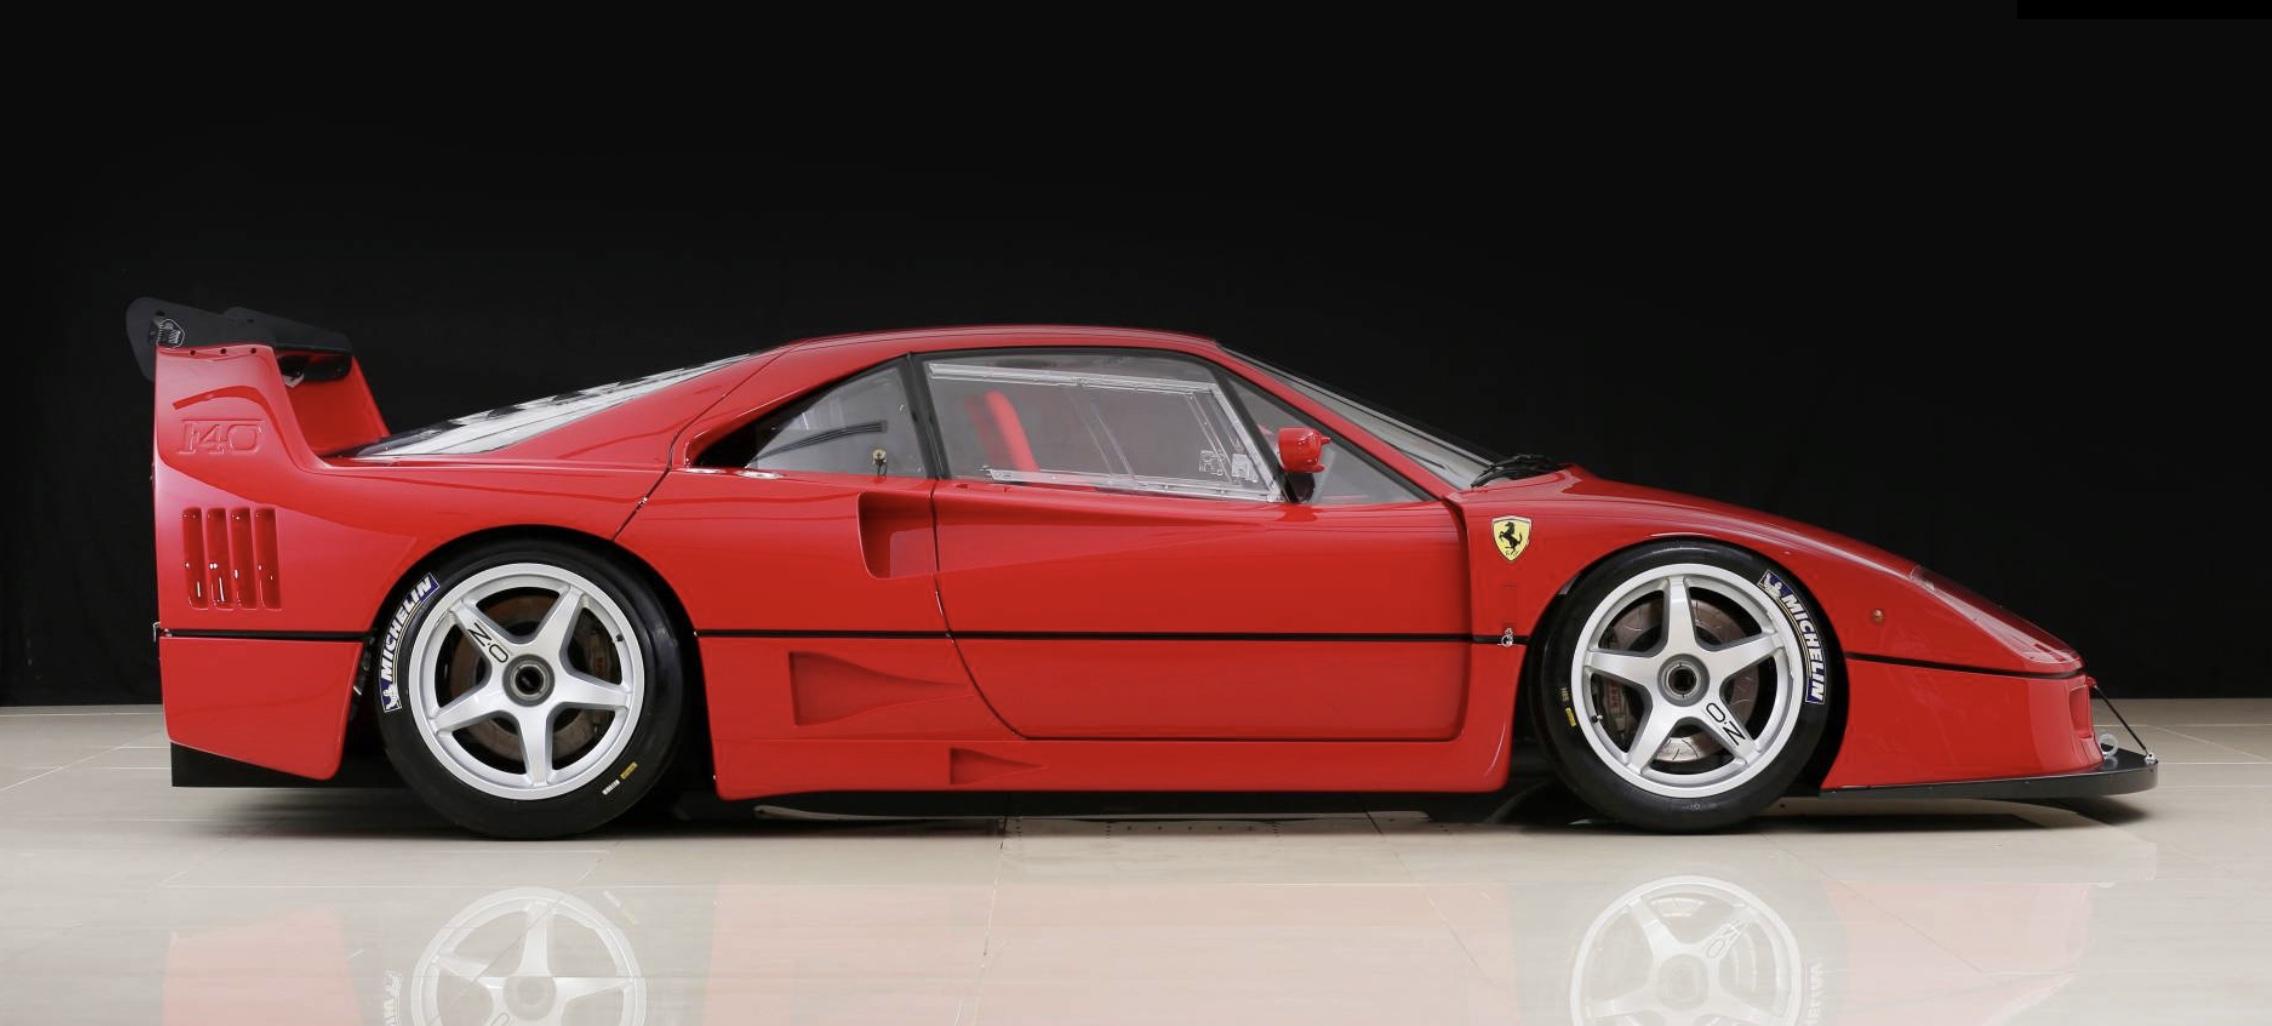 For Sale Ferrari F40 Lm Fchgt